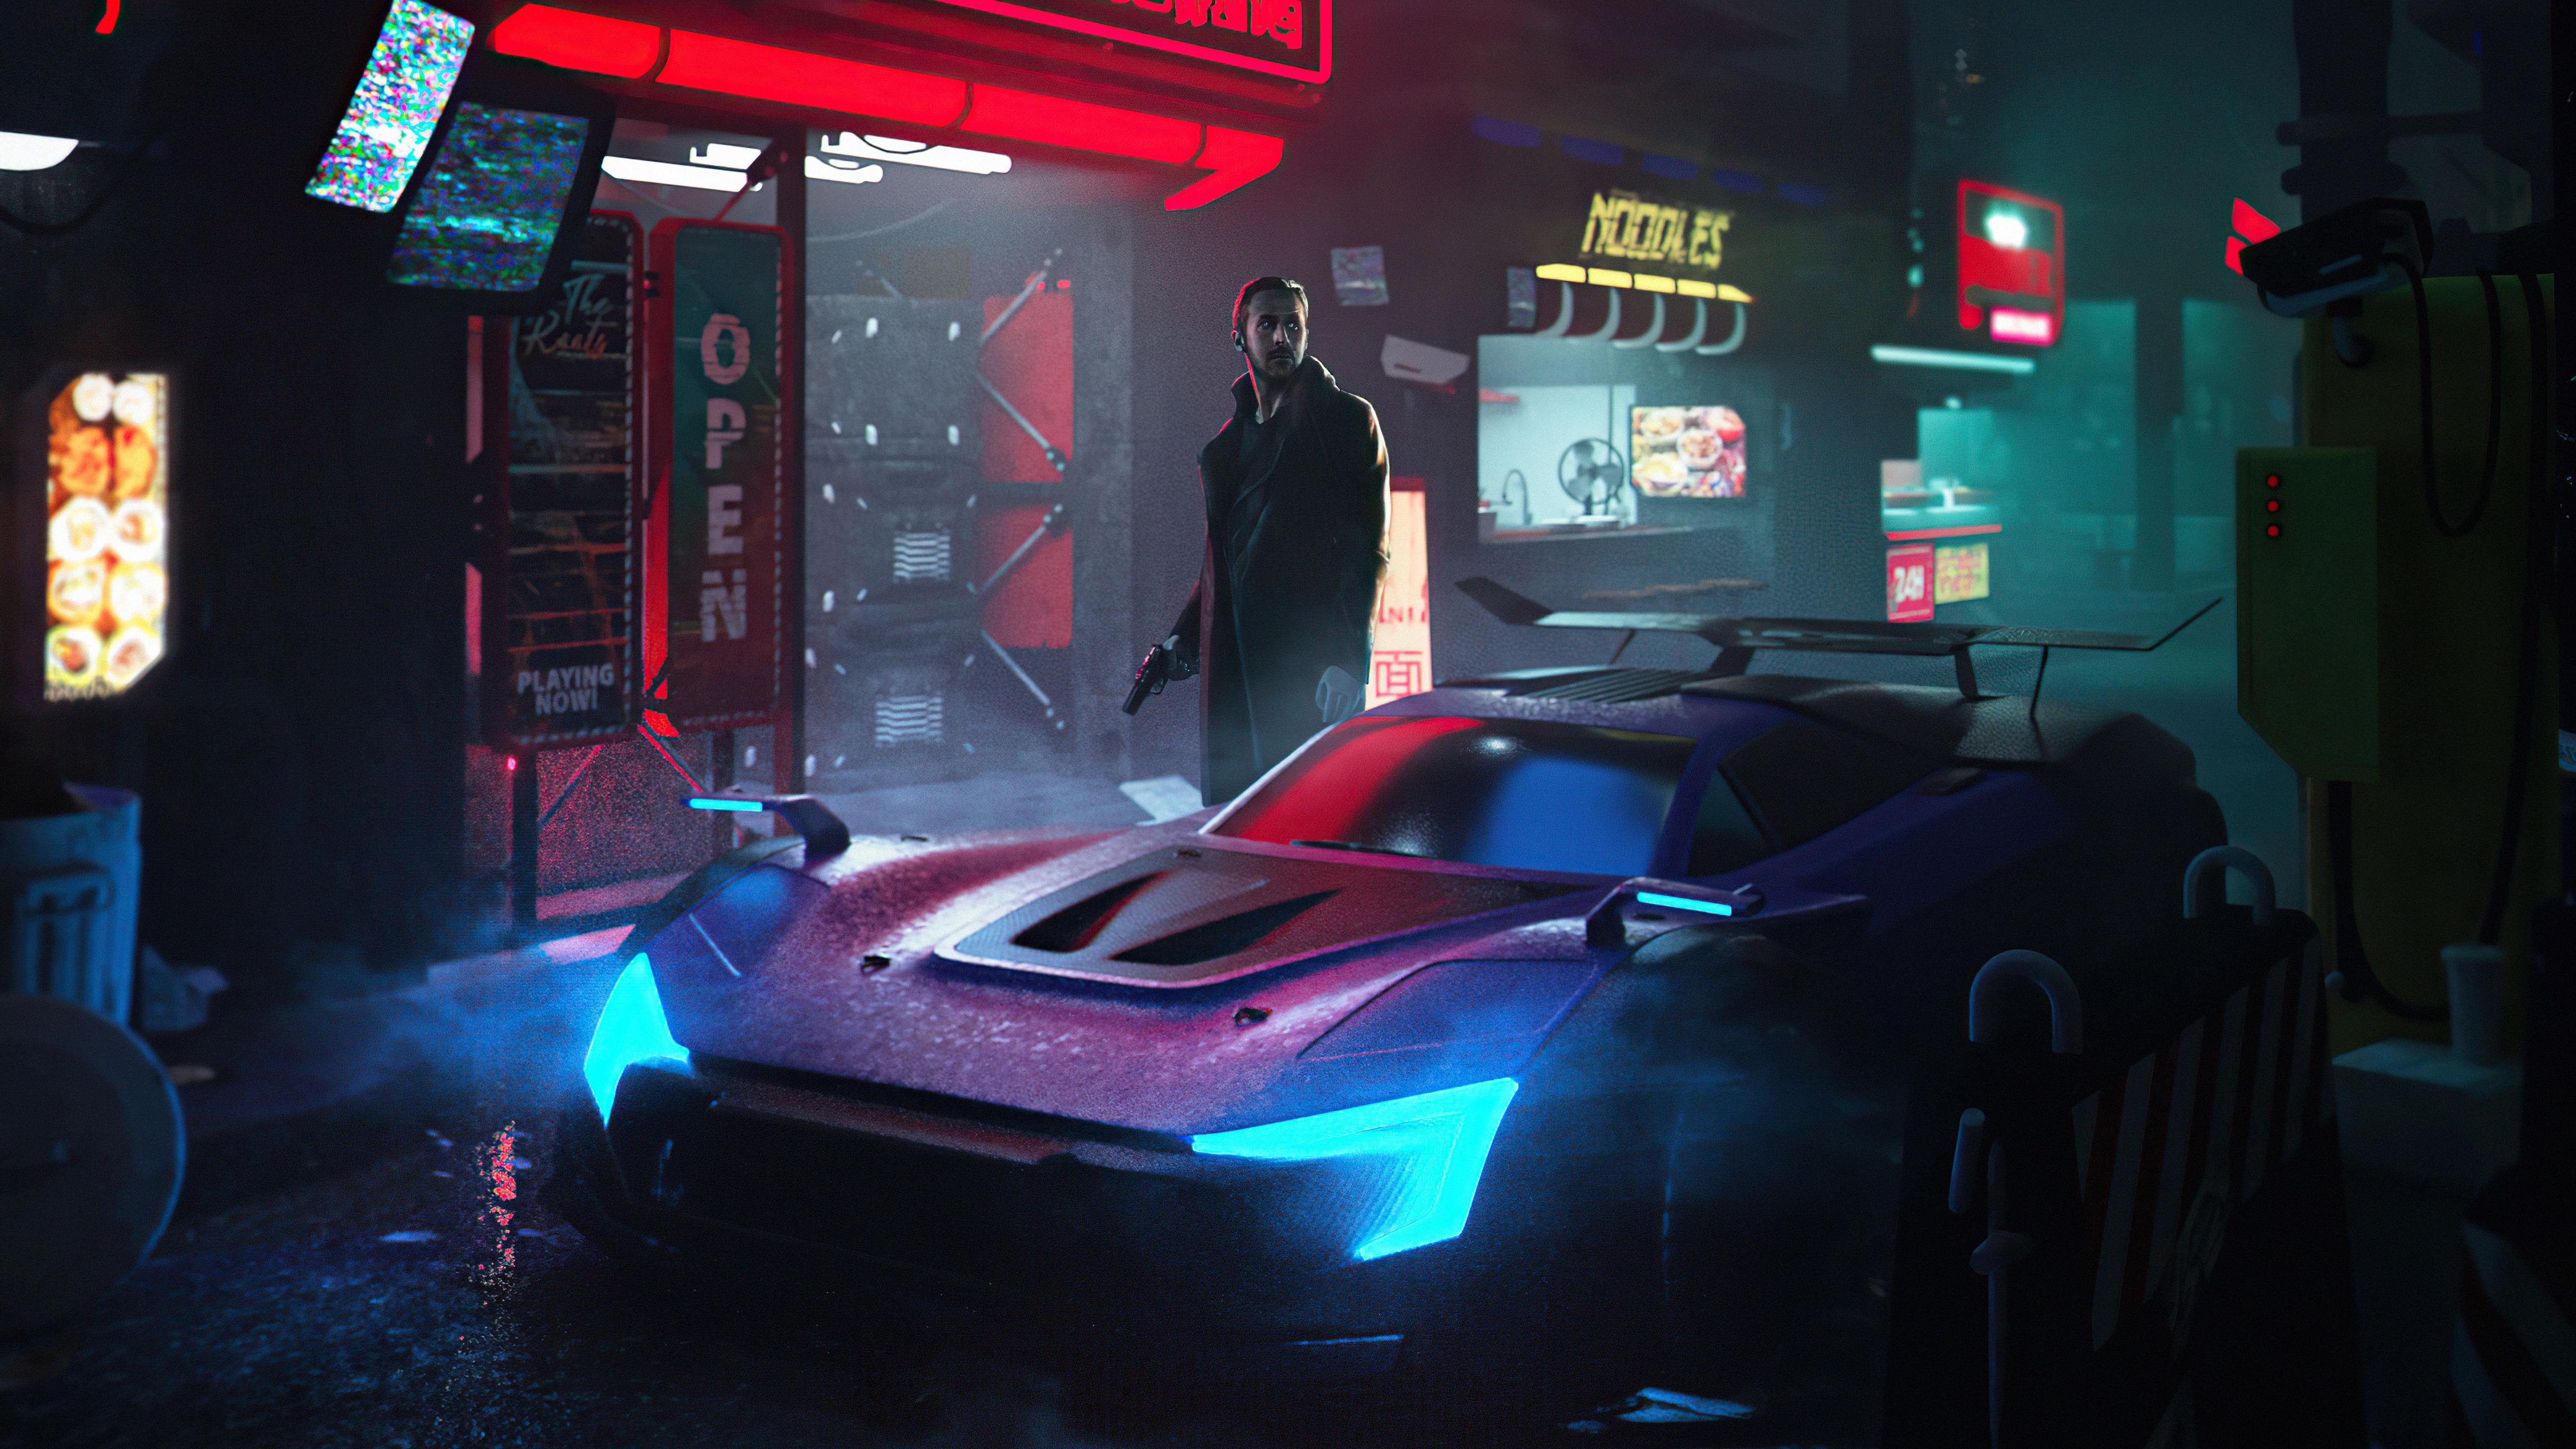 cyber city blade runner 4k 1618165824 - Cyber City Blade Runner 4k - Cyber City Blade Runner 4k wallpapers